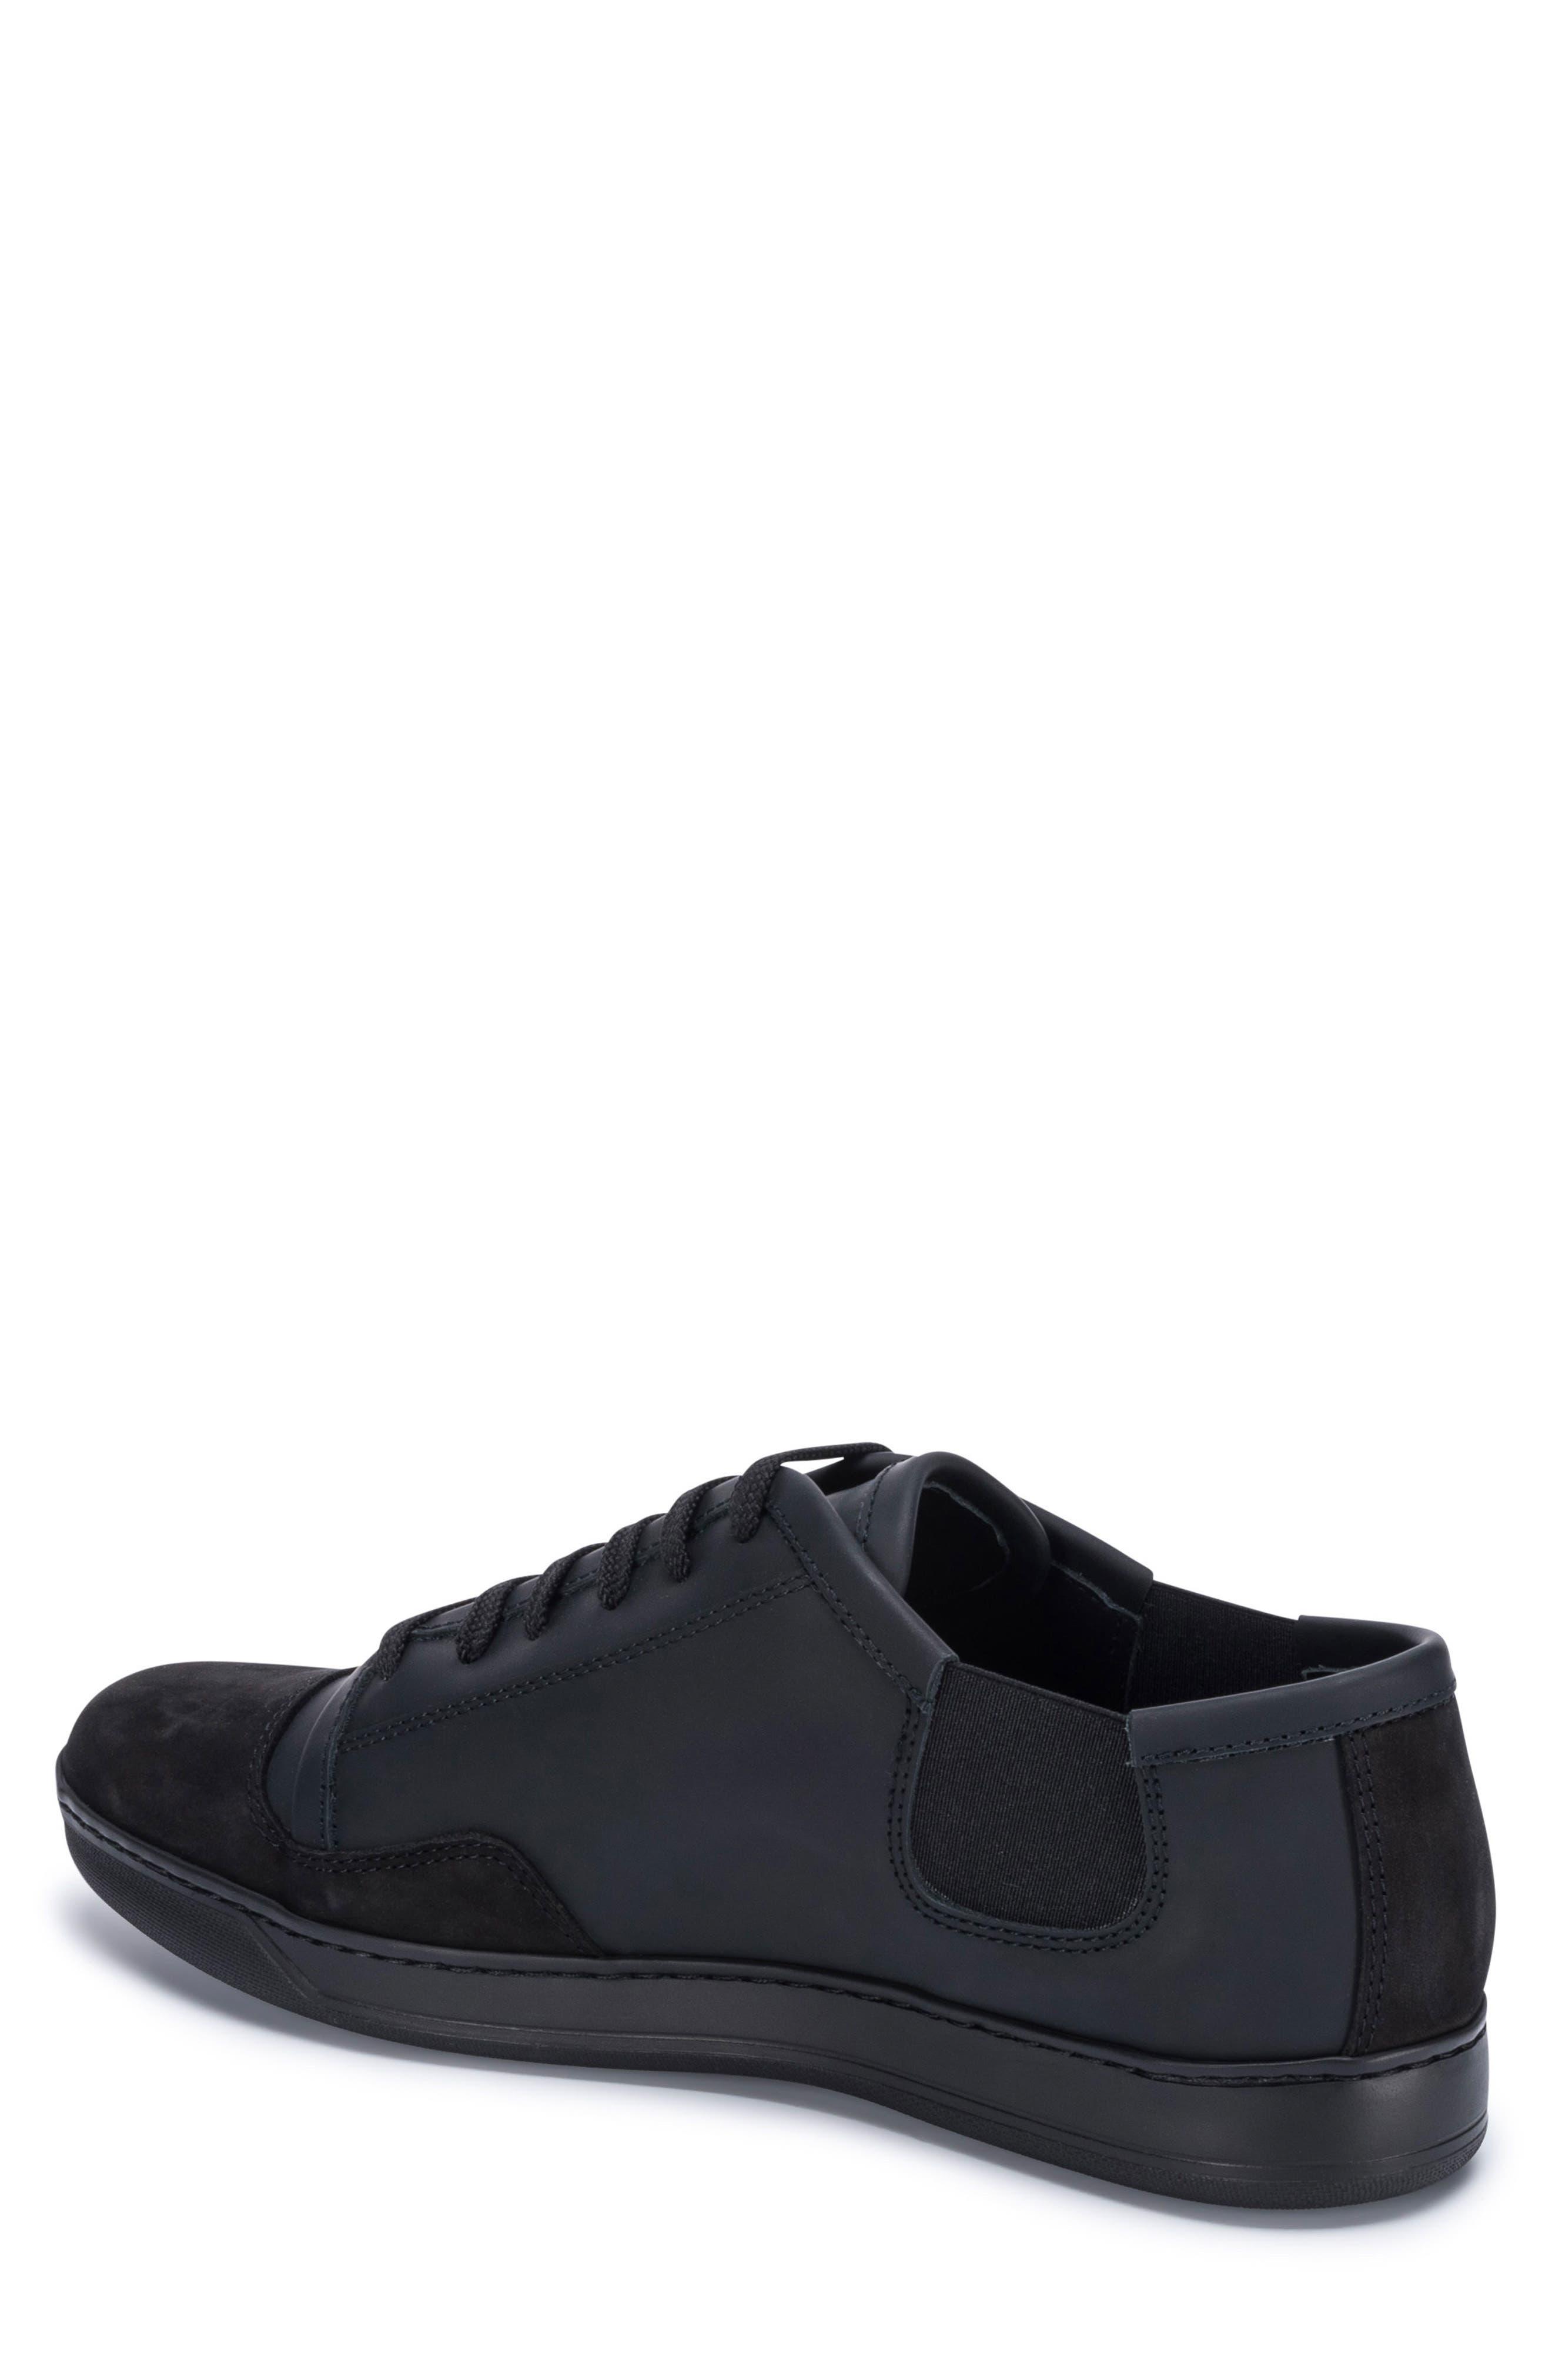 Bellagio Sneaker,                             Alternate thumbnail 2, color,                             Black